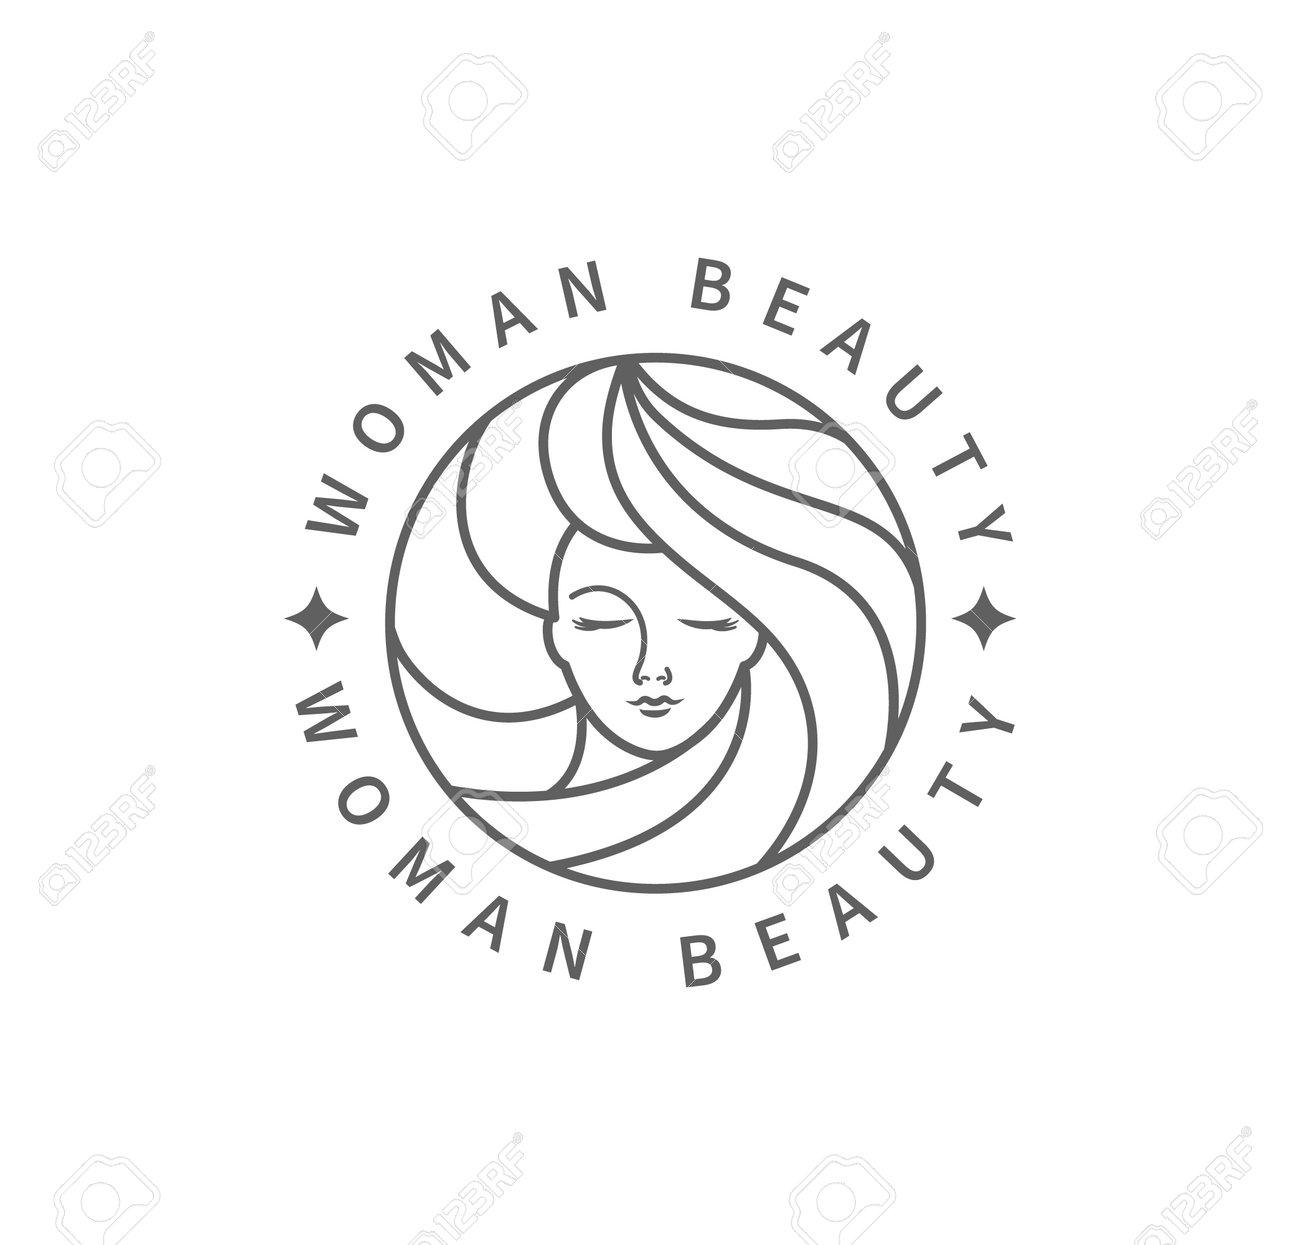 Woman beauty fashion logo. - 173377225